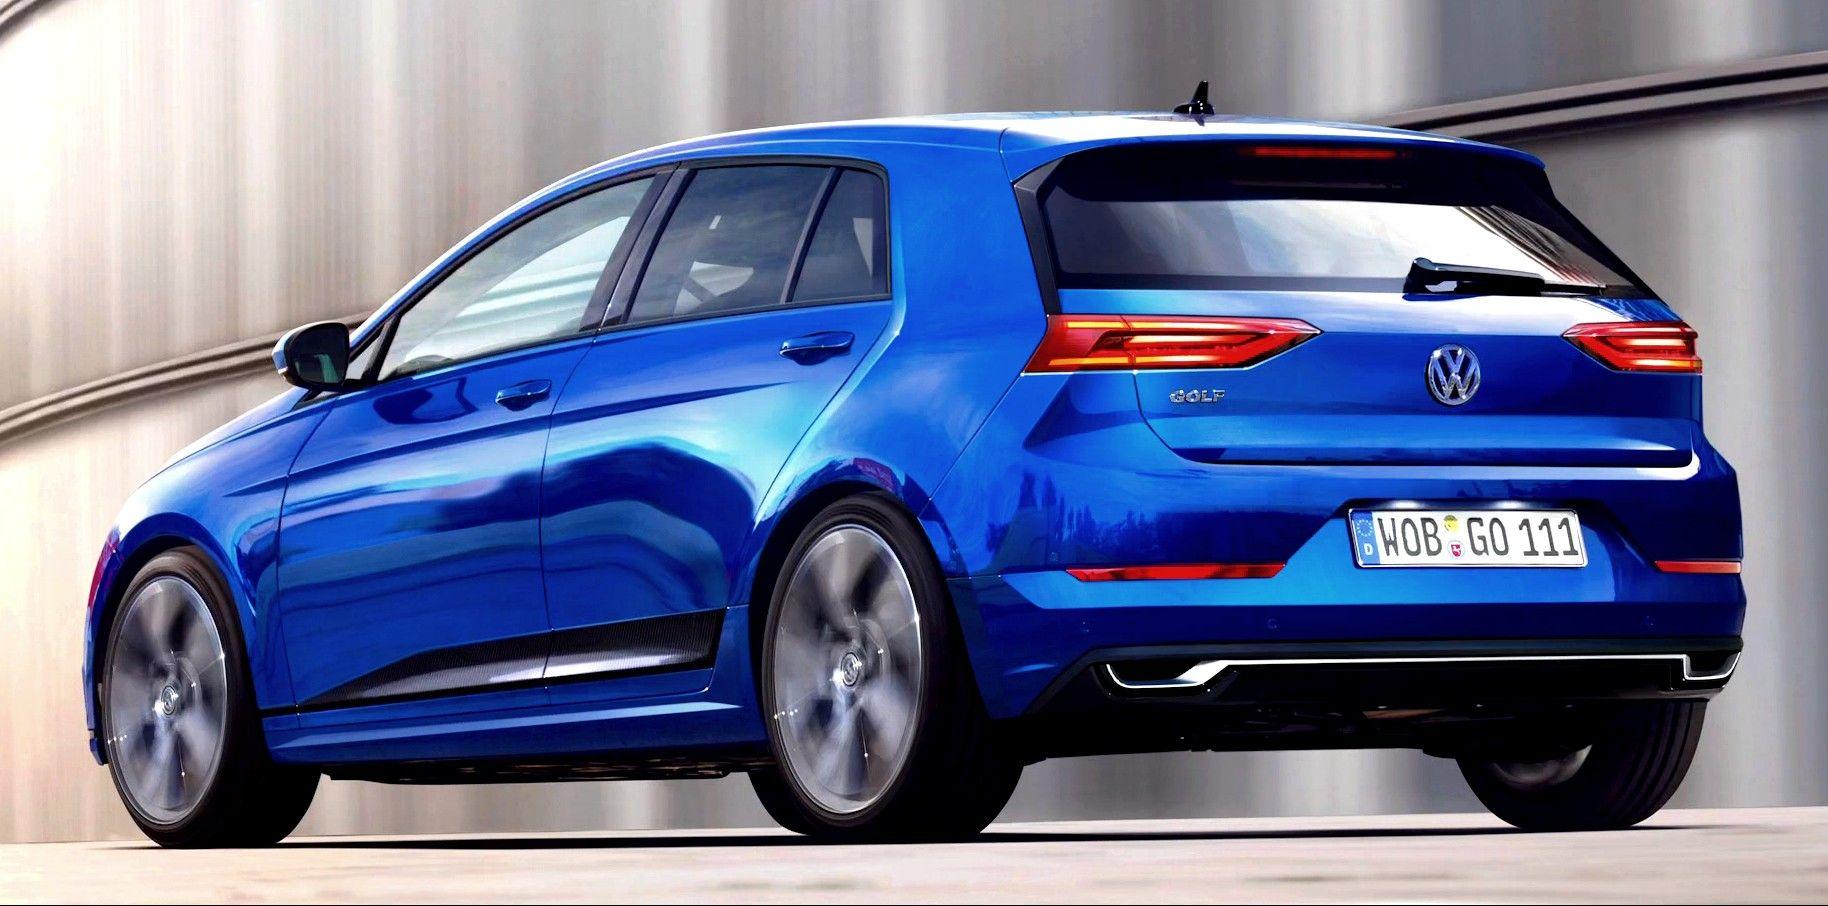 2018 Volkswagen Golf 8 New Pictures Revealed Motos